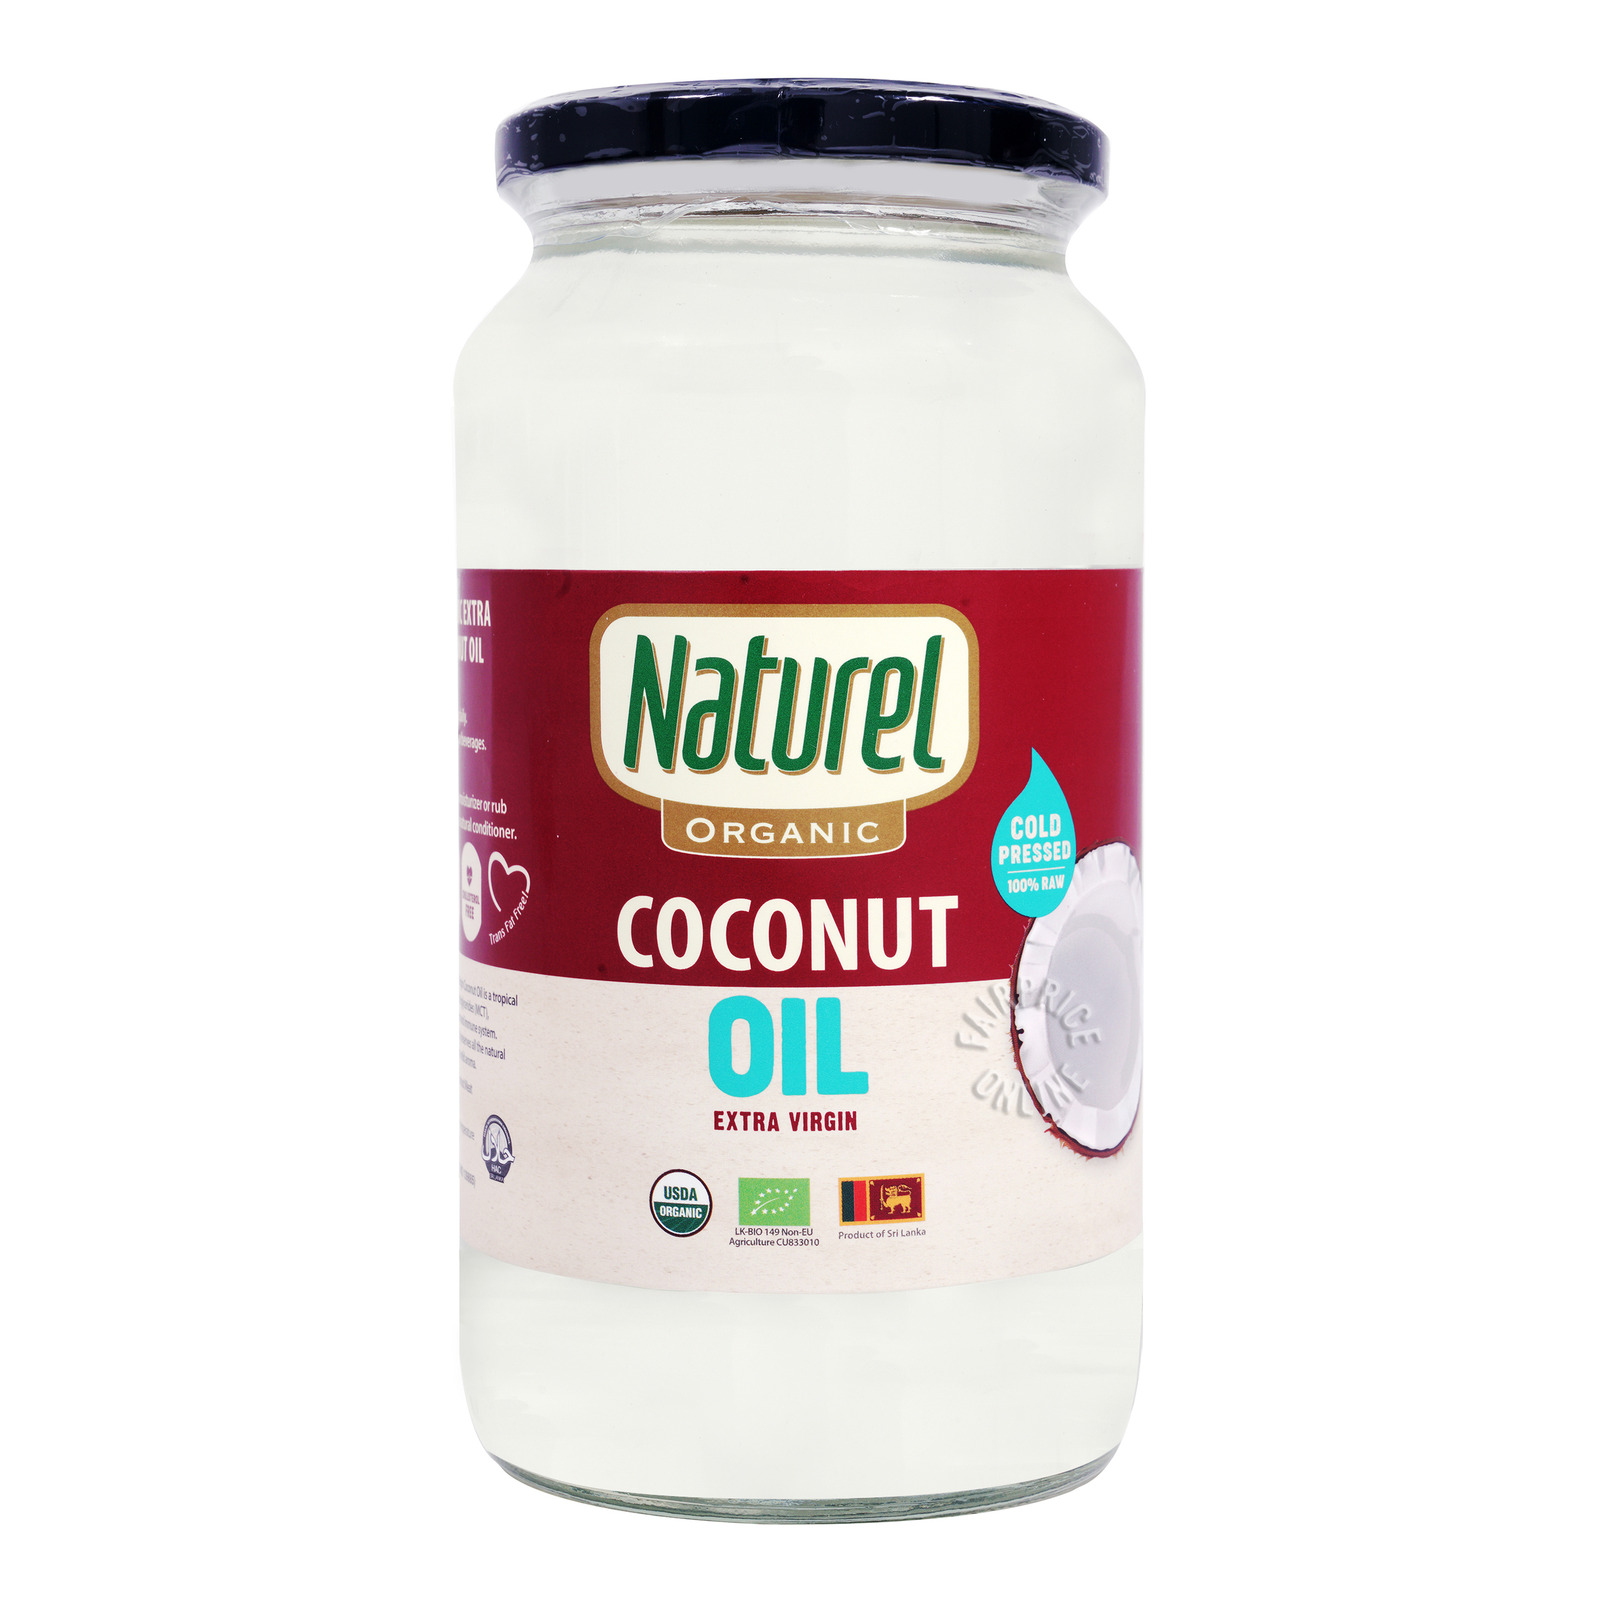 NATUREL Organic Extra Virgin Coconut Oil 1L